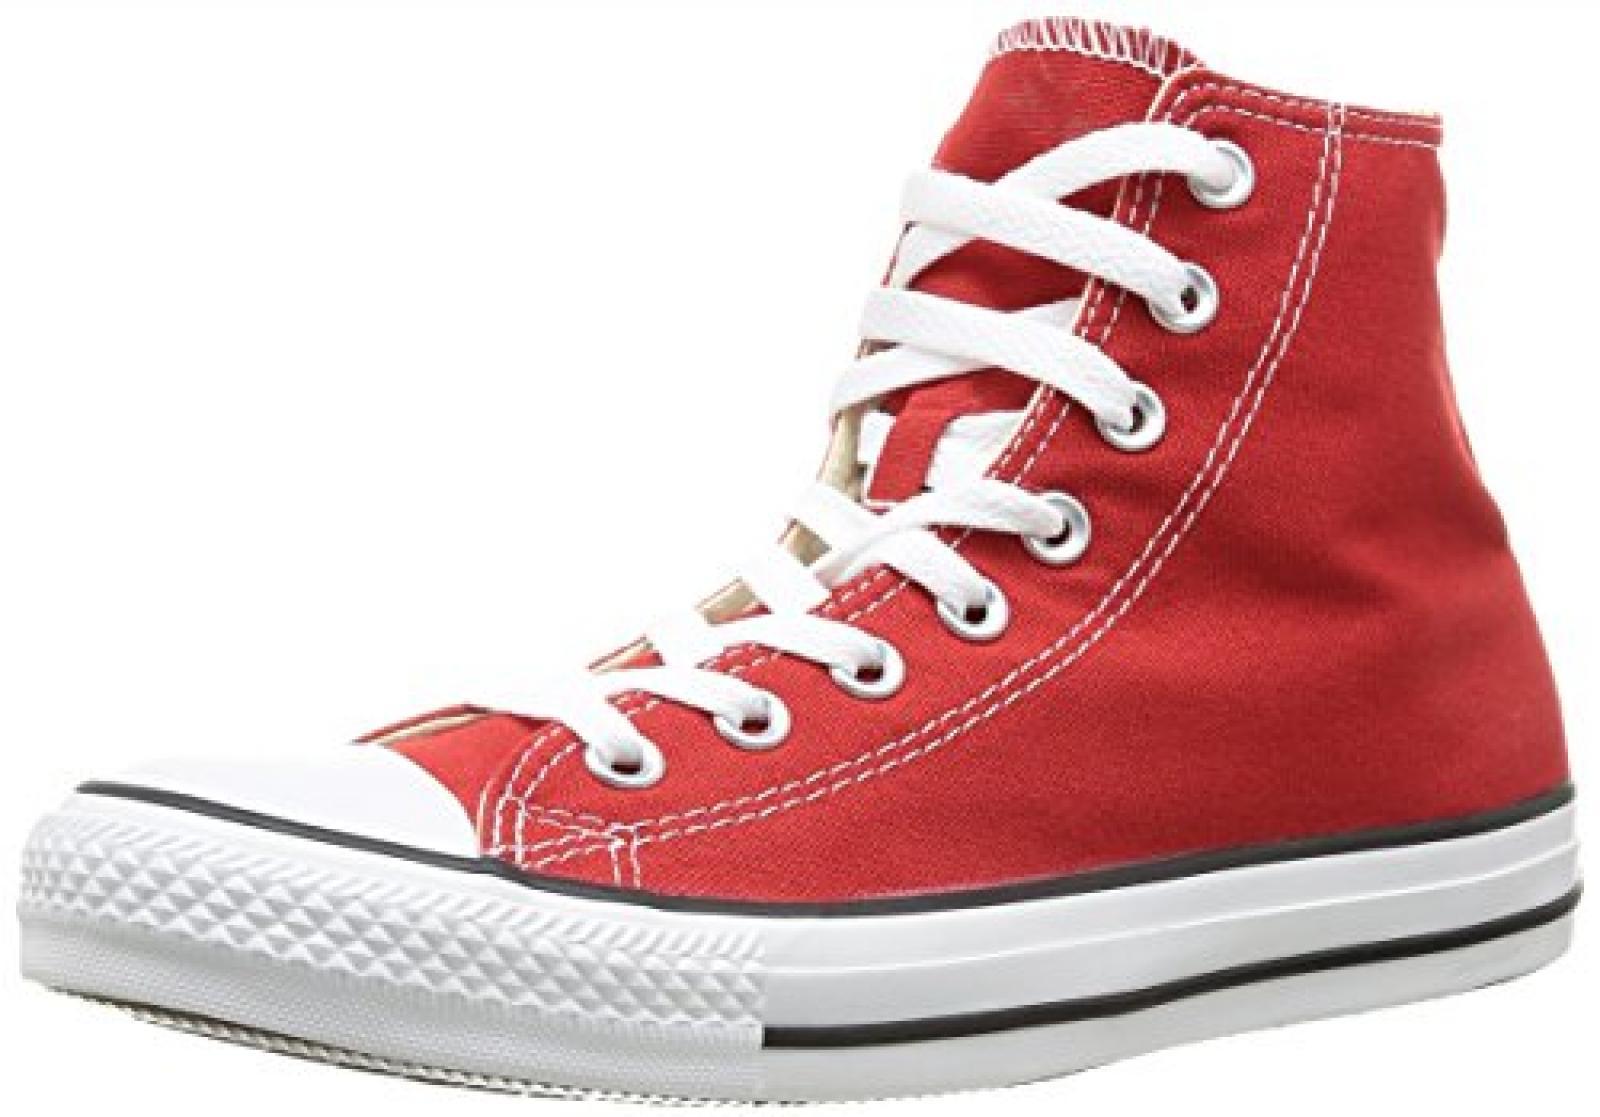 Converse Chuck Taylor All Star Adulte Seasonal Hi 15852 Unisex - Erwachsene Sneaker